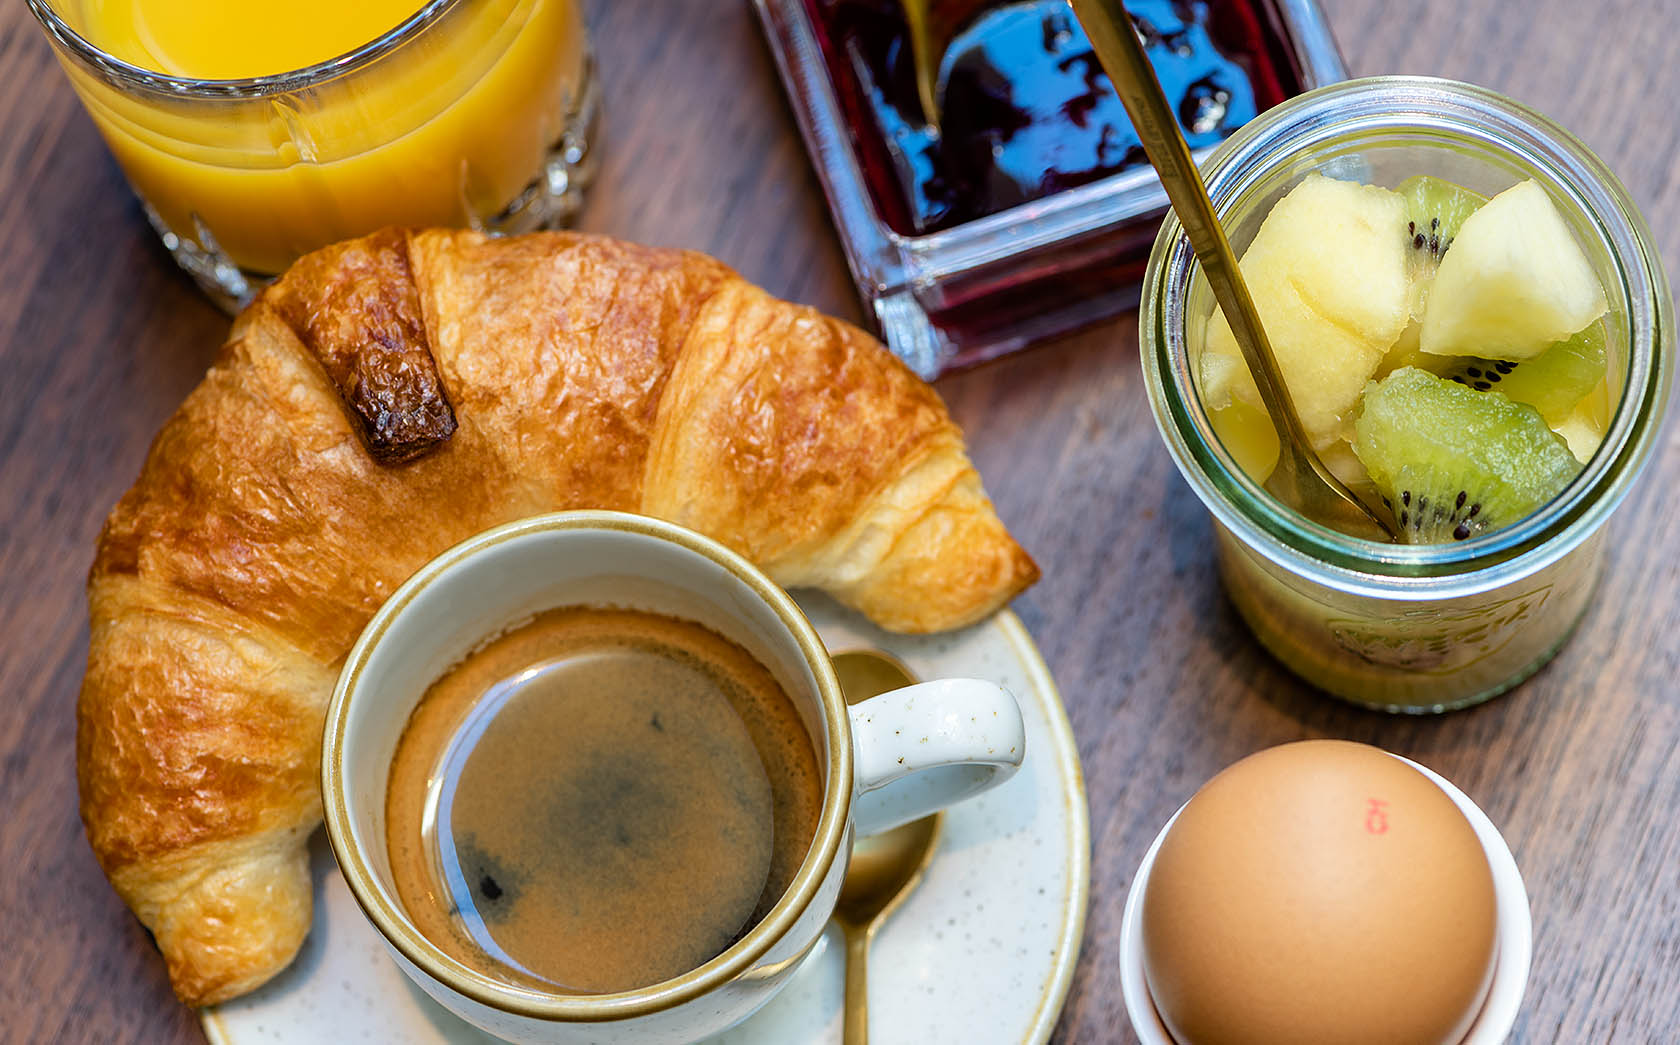 Bestes Frühstück bei Scheuble